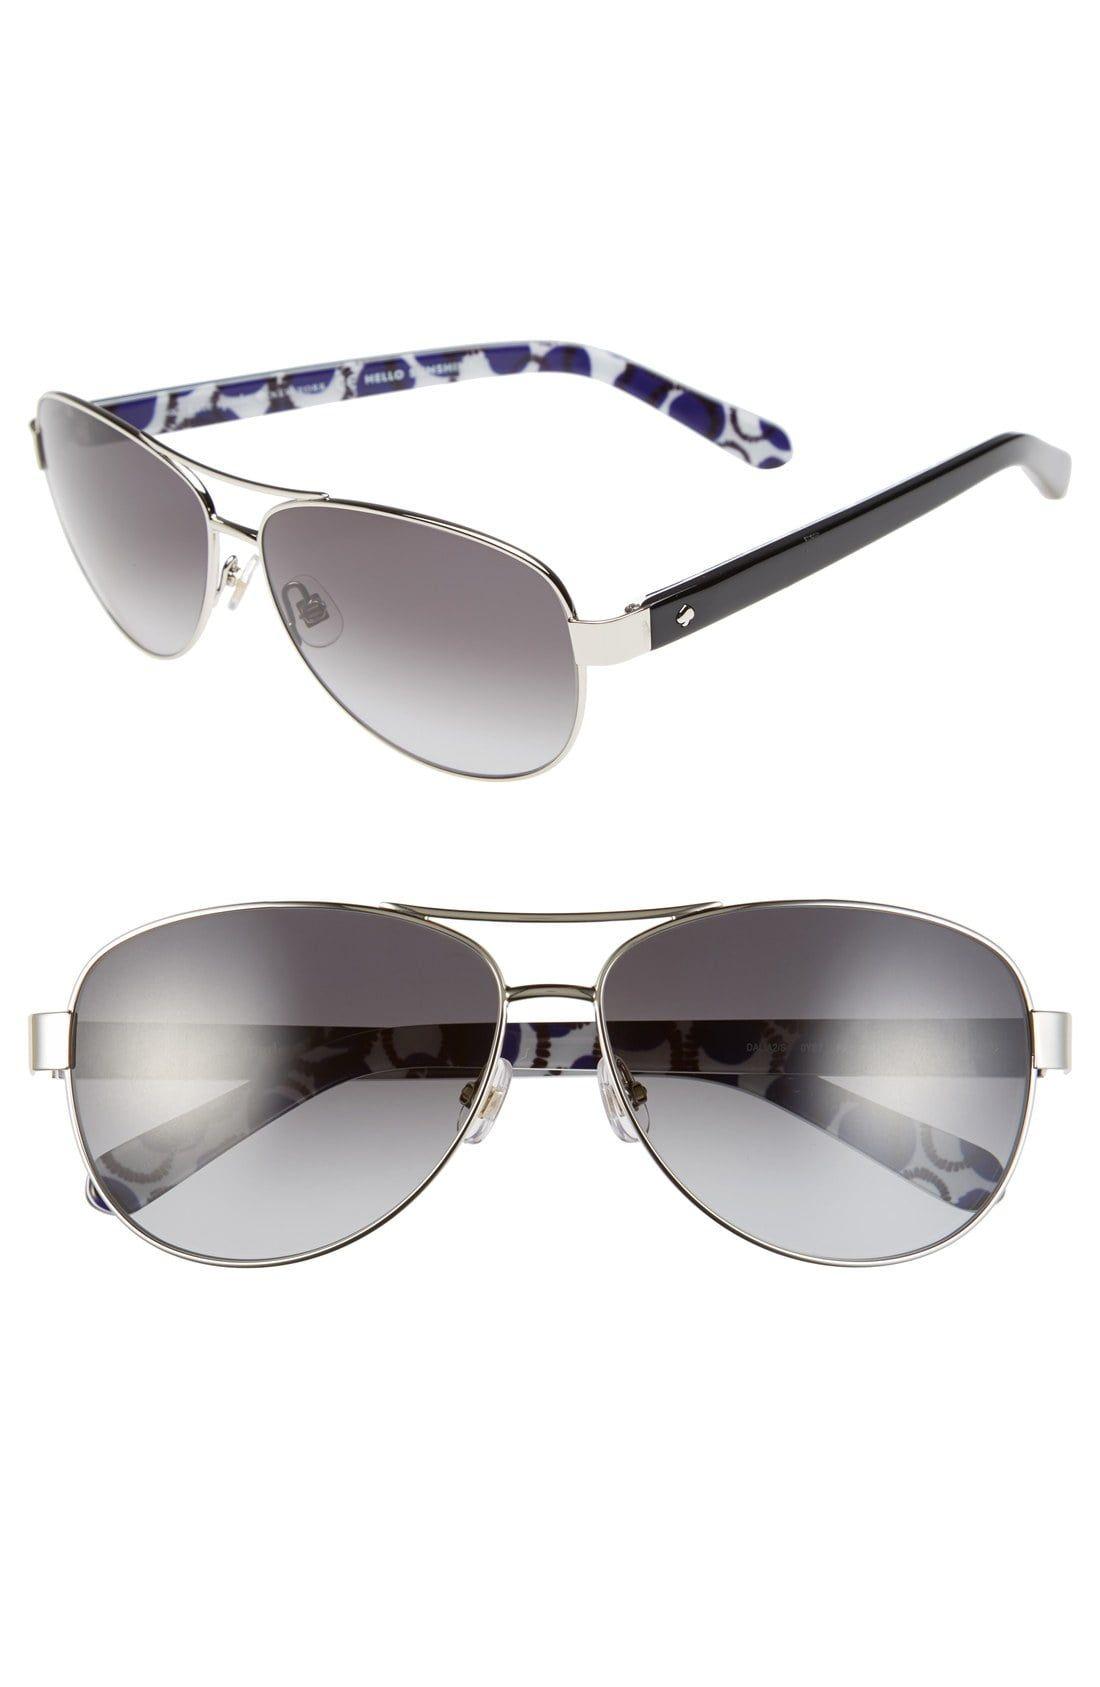 7a38863146c9 Women's Kate Spade New York 'Dalia2' 58Mm Aviator Sunglasses - Silver/ Dots